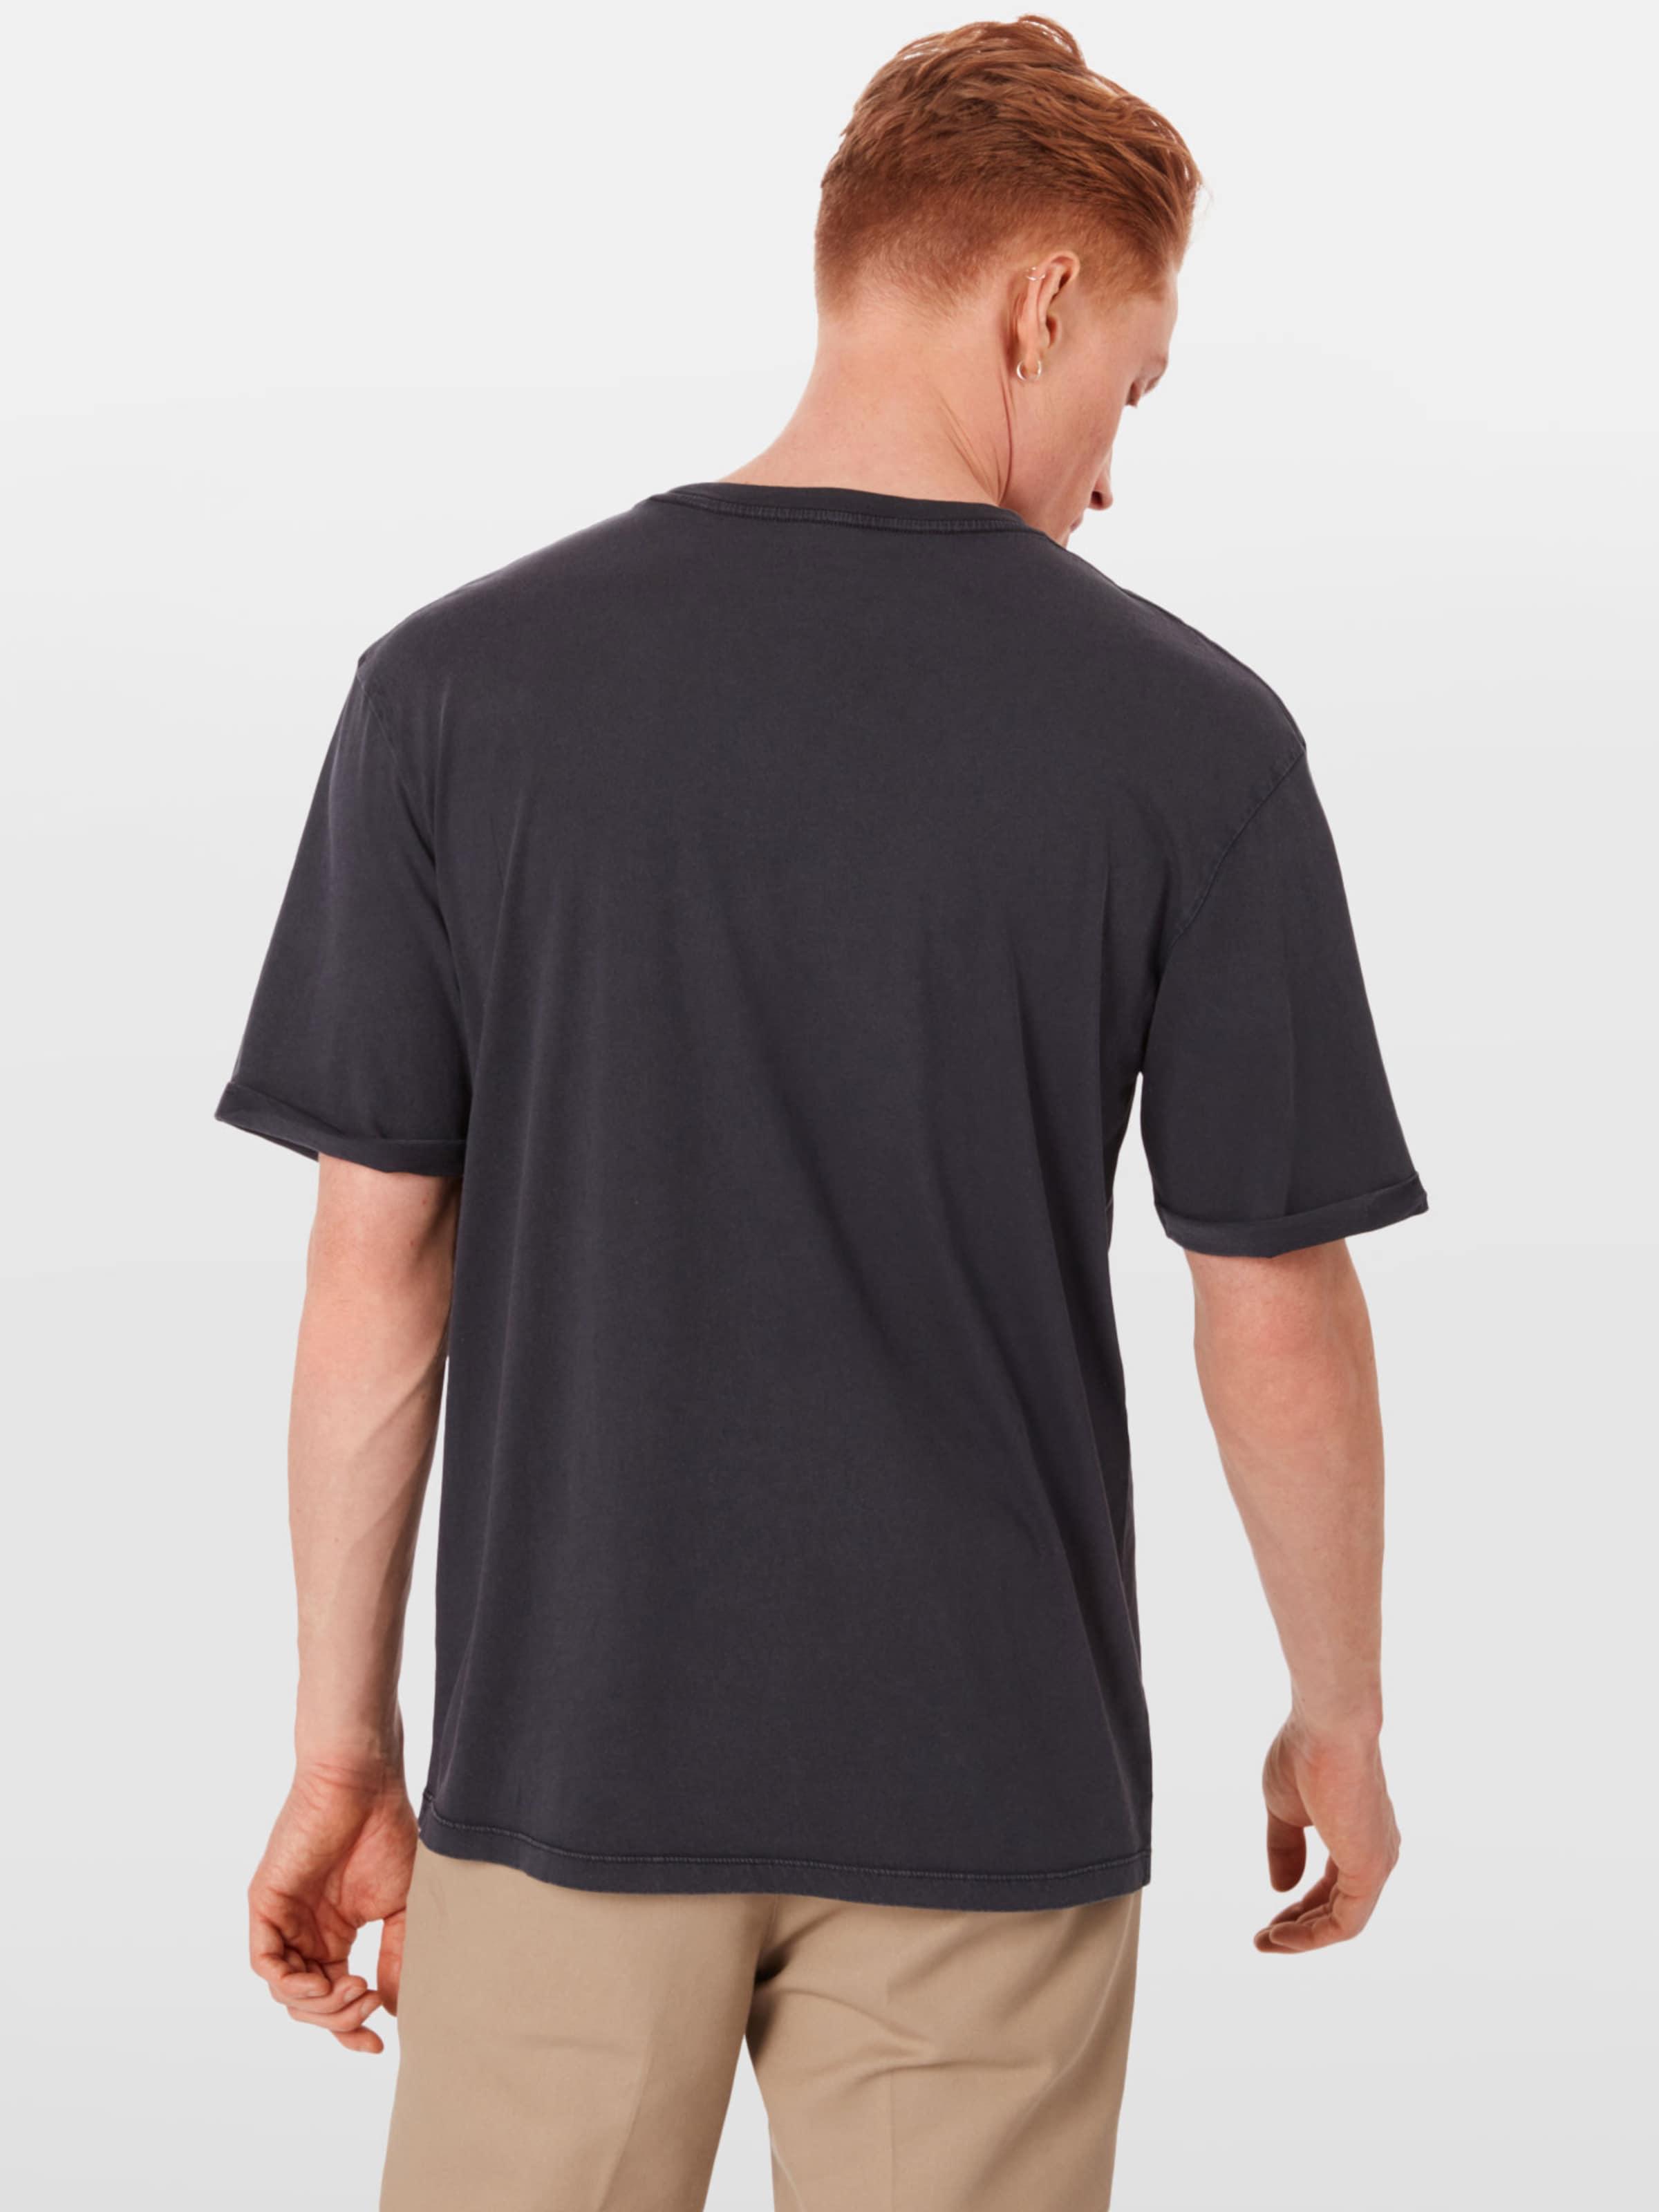 Jackamp; NoirBlanc Jones 'starks' shirt En T LRj45A